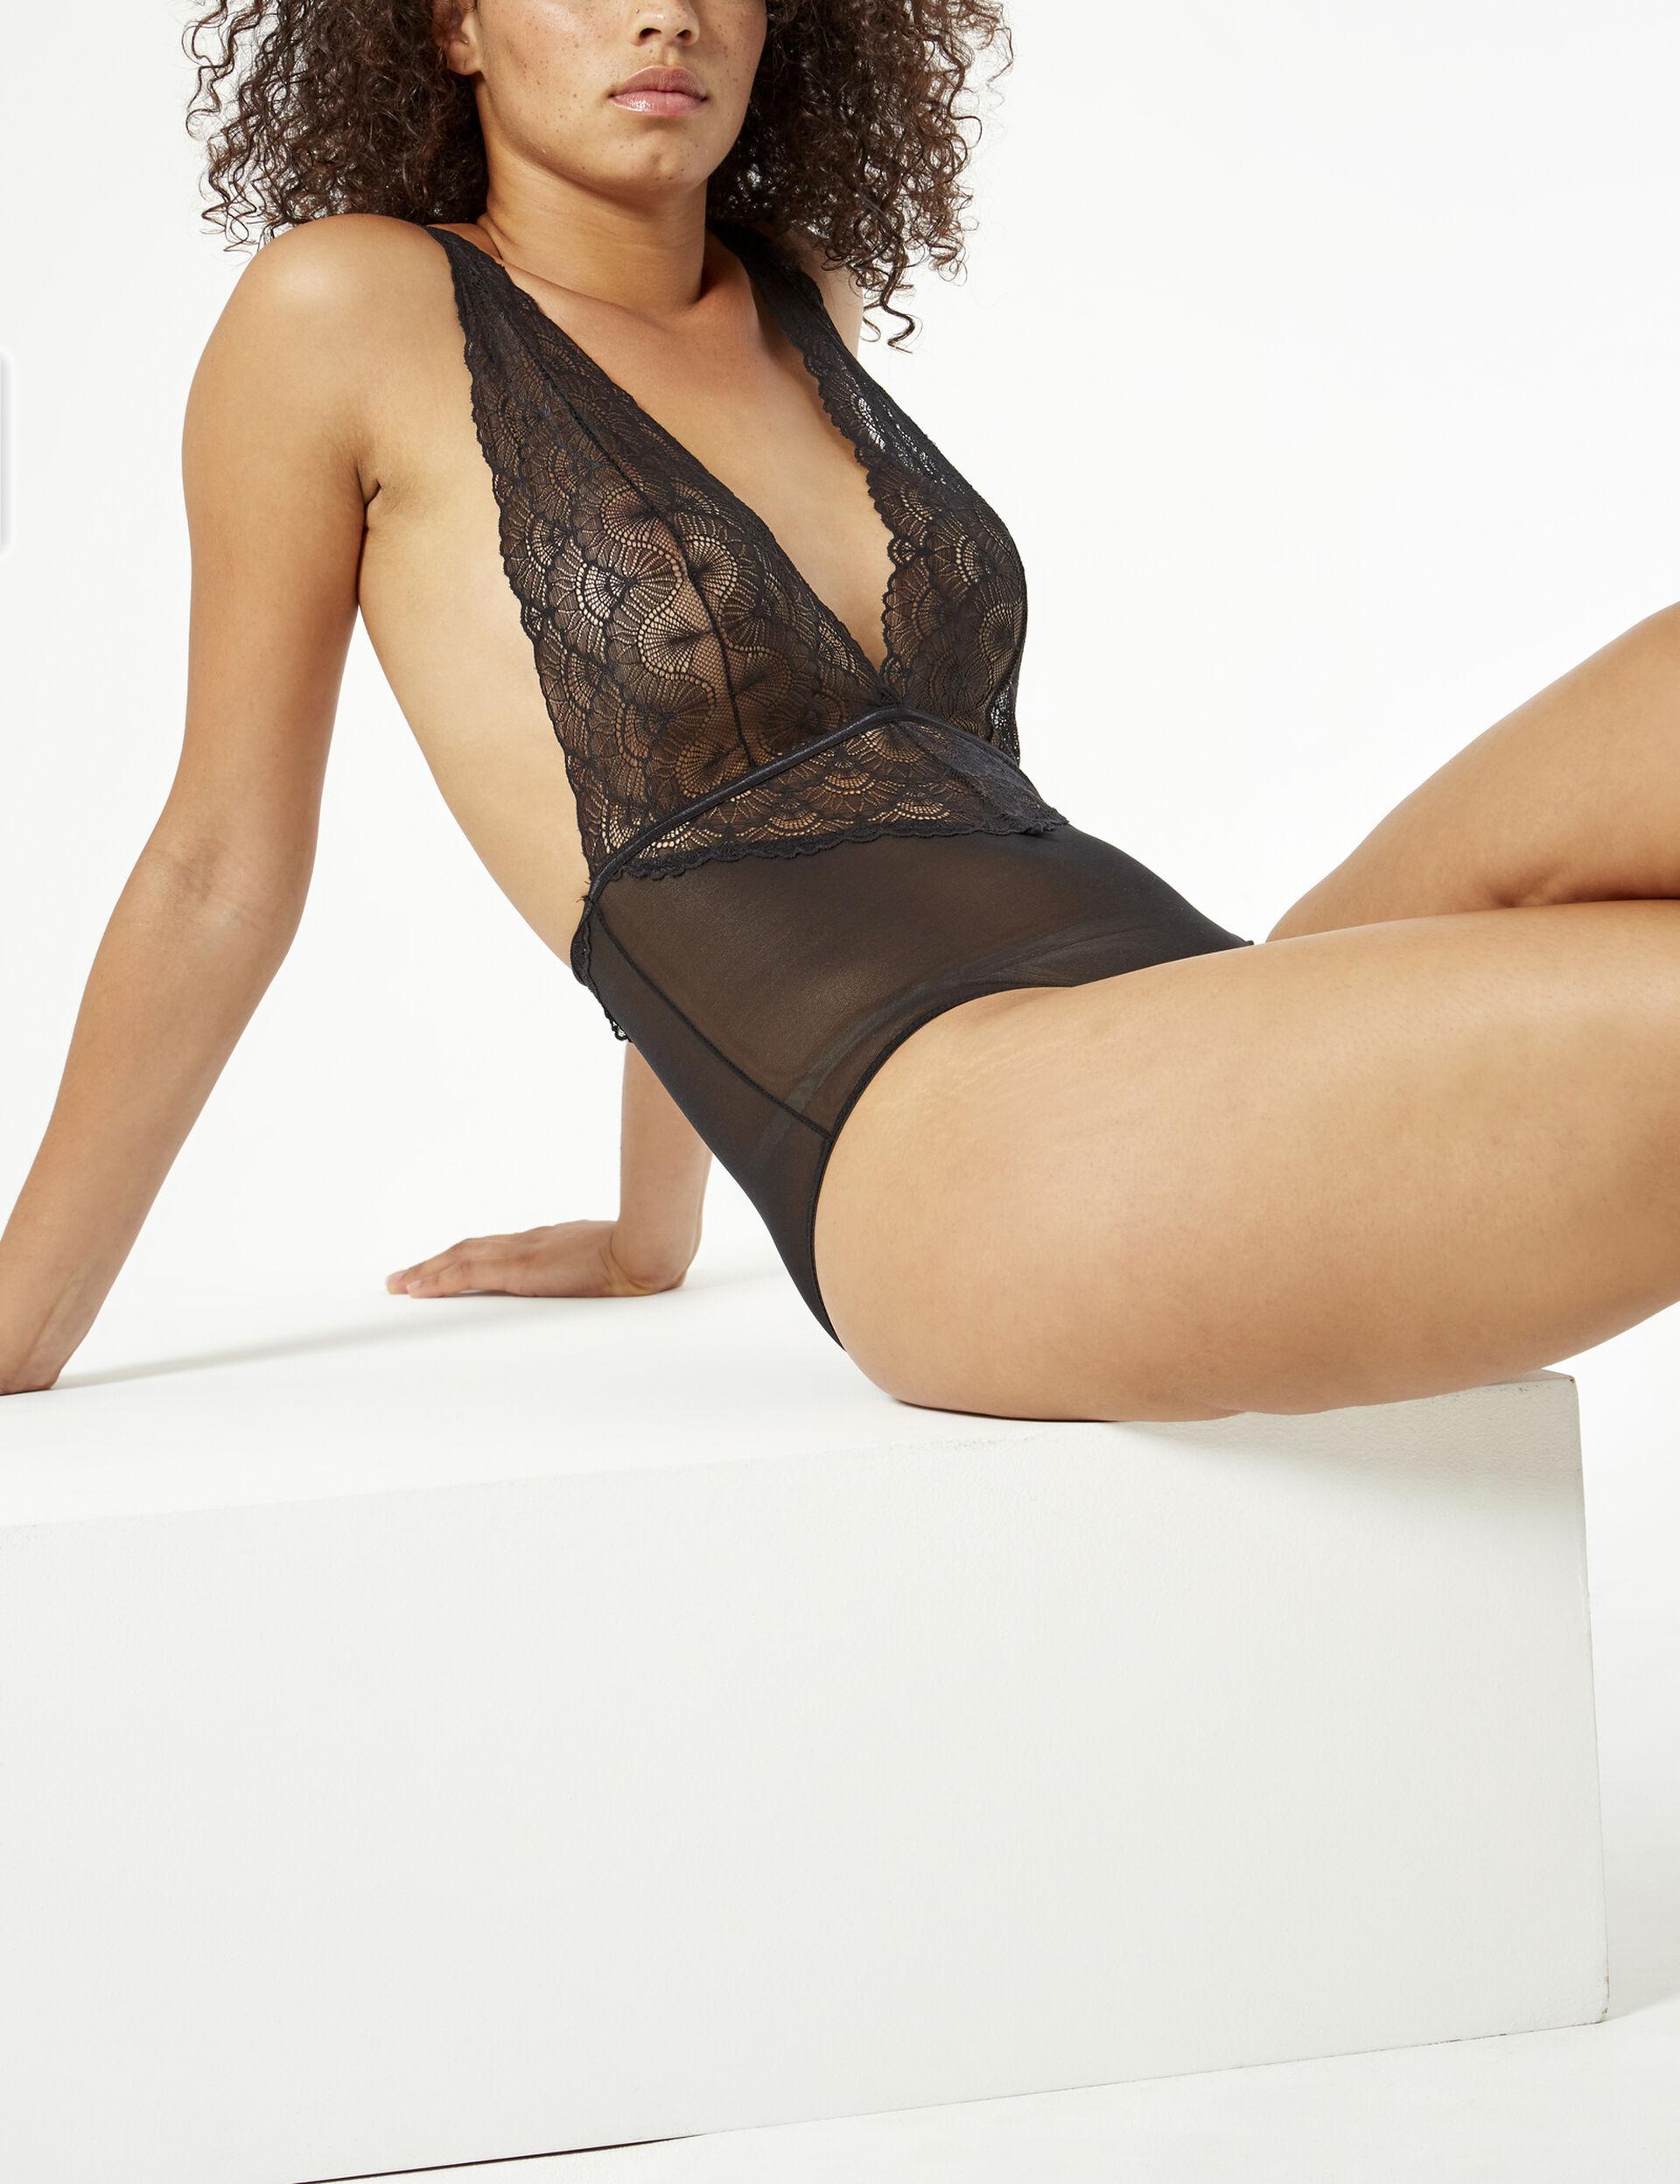 Low-cut bodysuit